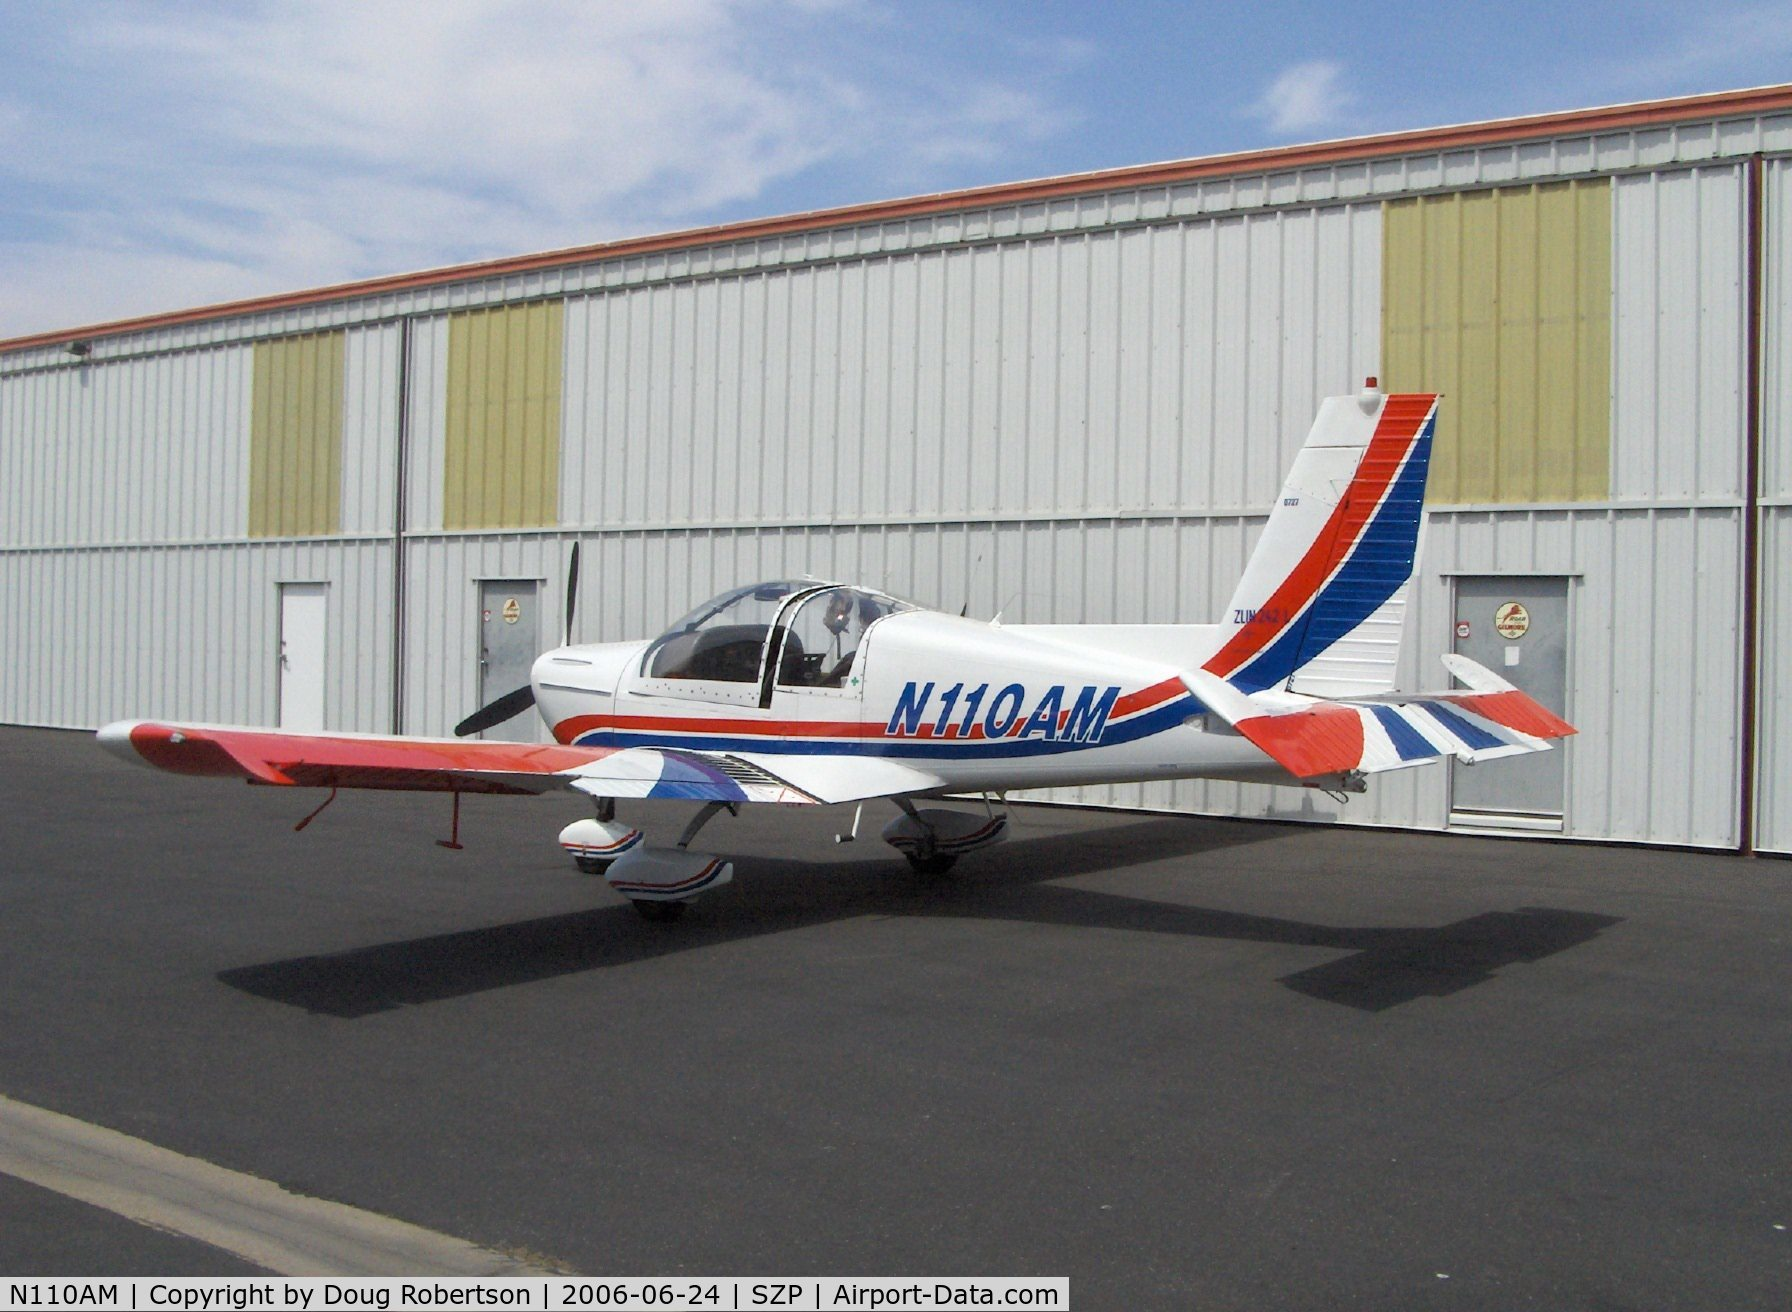 N110AM, 1996 Zlin Z-242L C/N 0727, 1996 Moravan Zlin Z242L, Lycoming AEIO-360-B 200 Hp, postflight